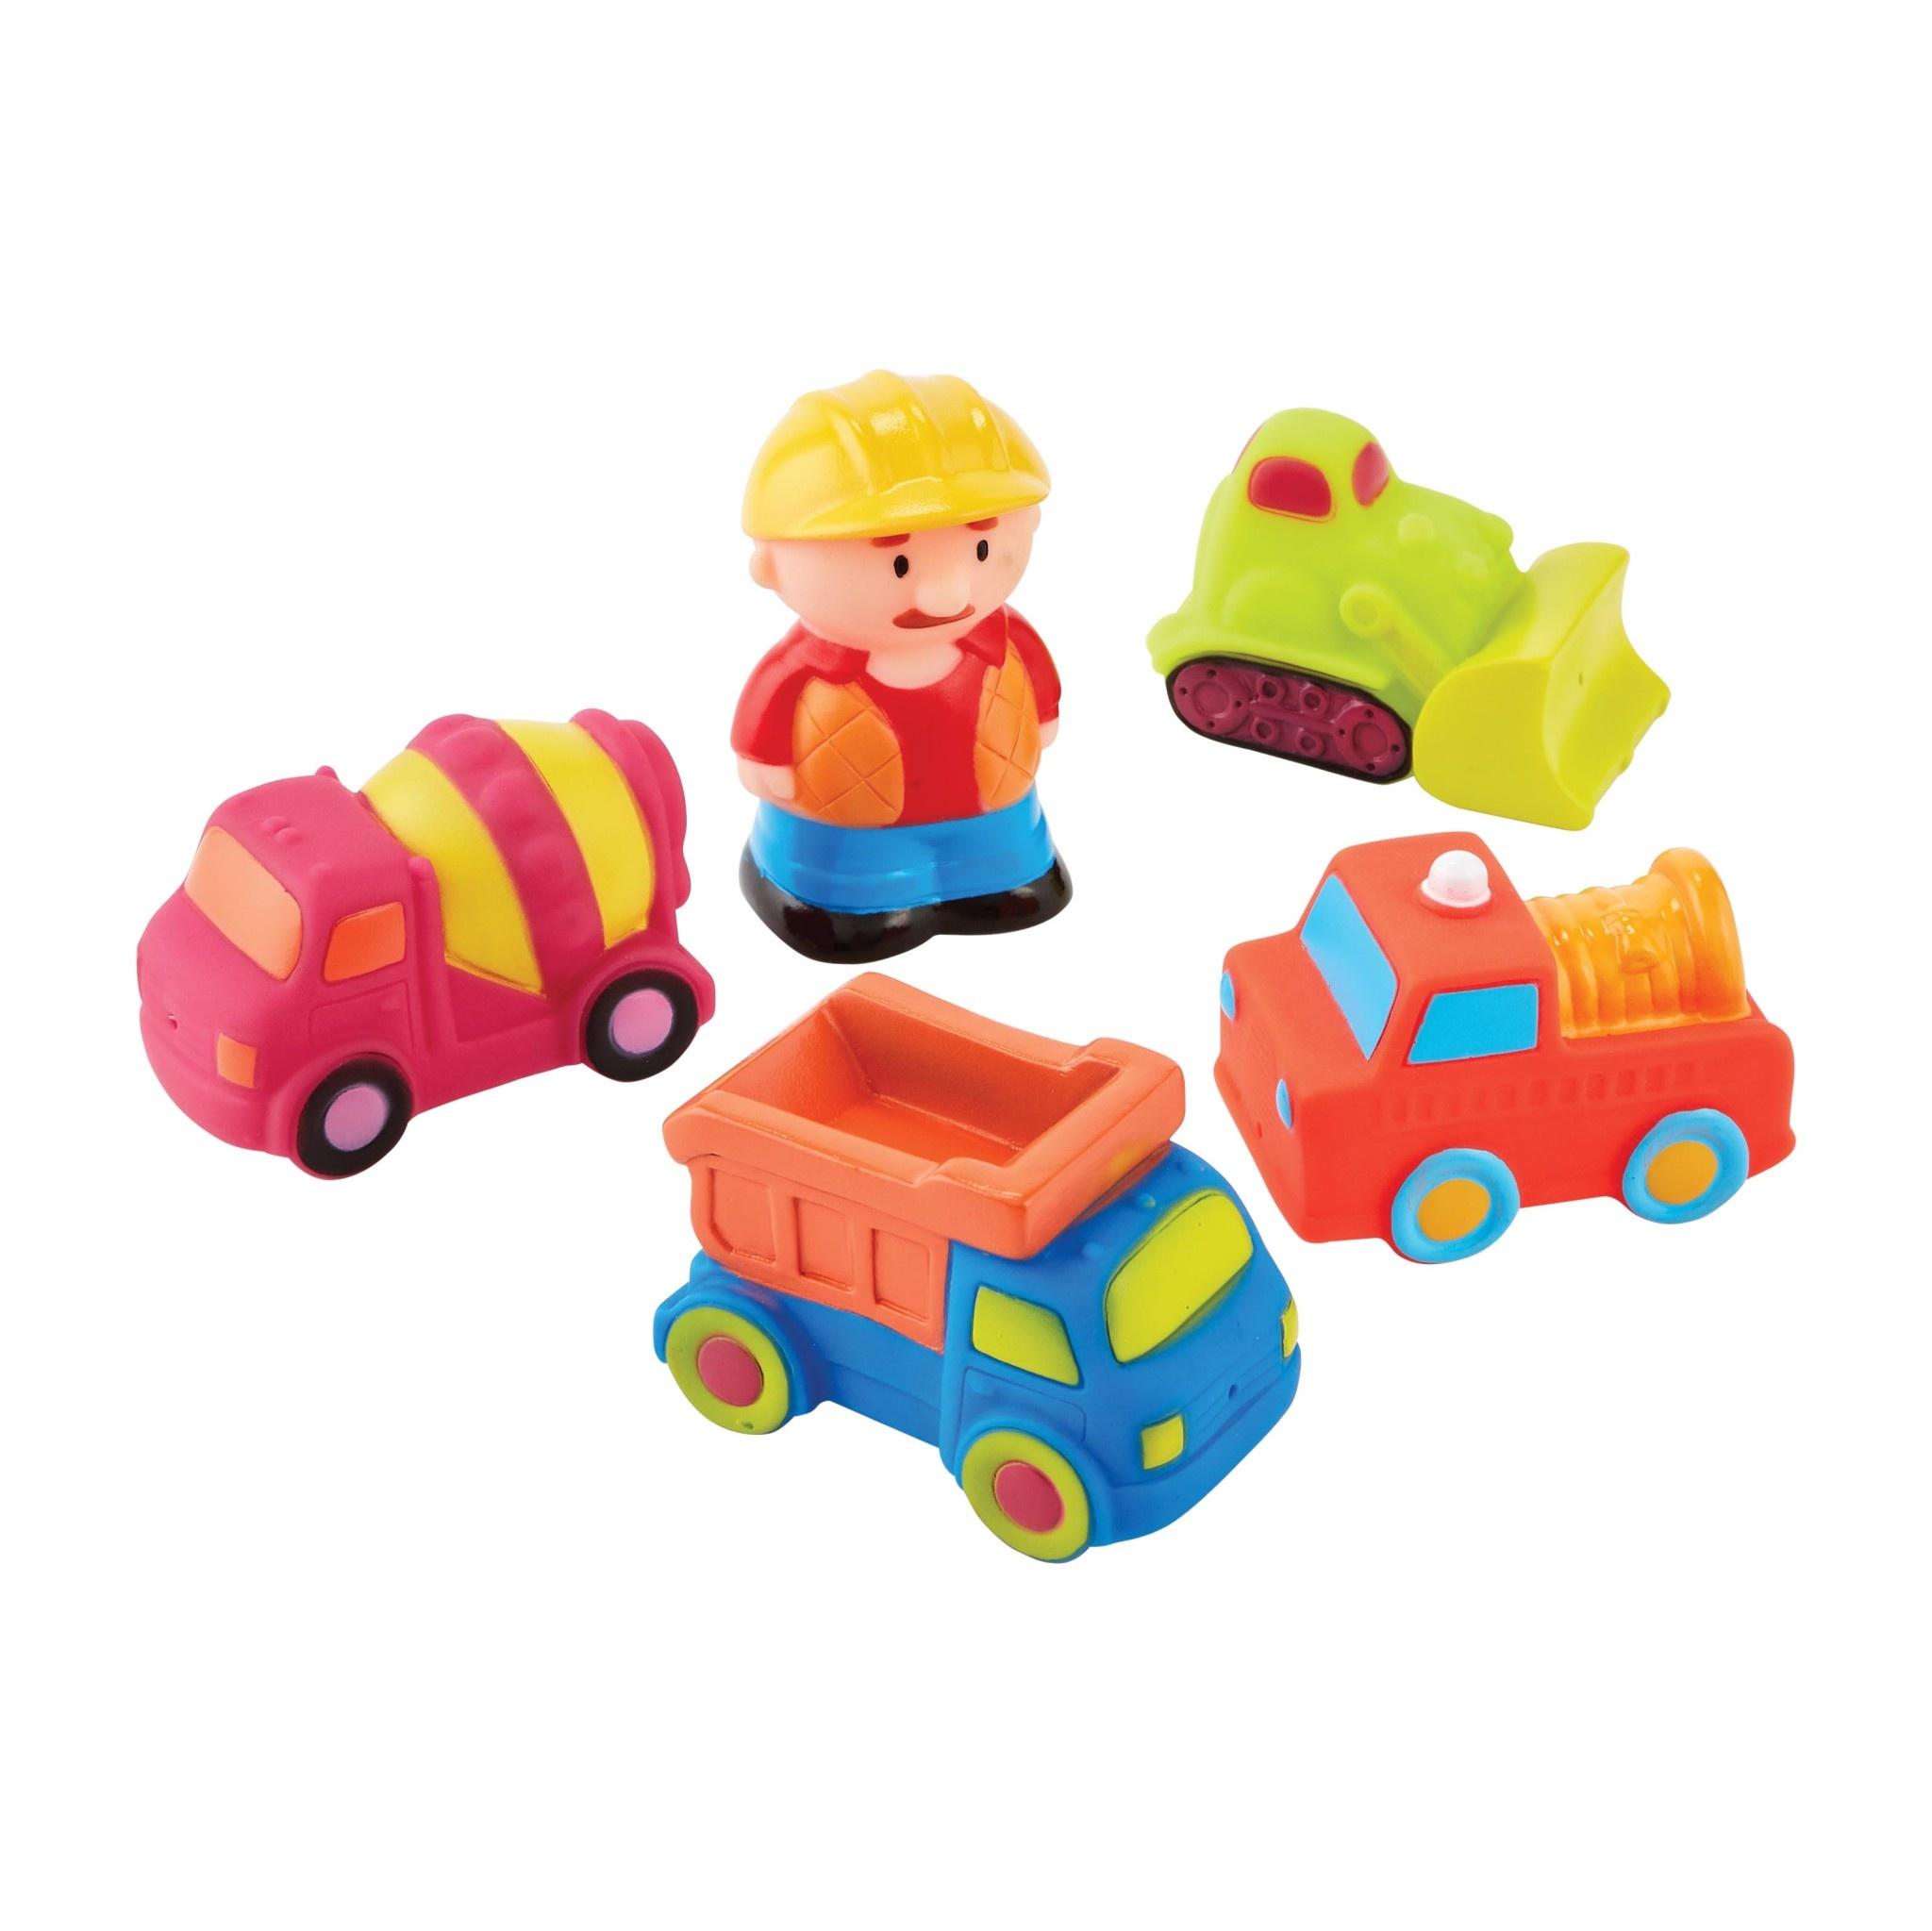 Mud Pie Construction Bath Toy Set